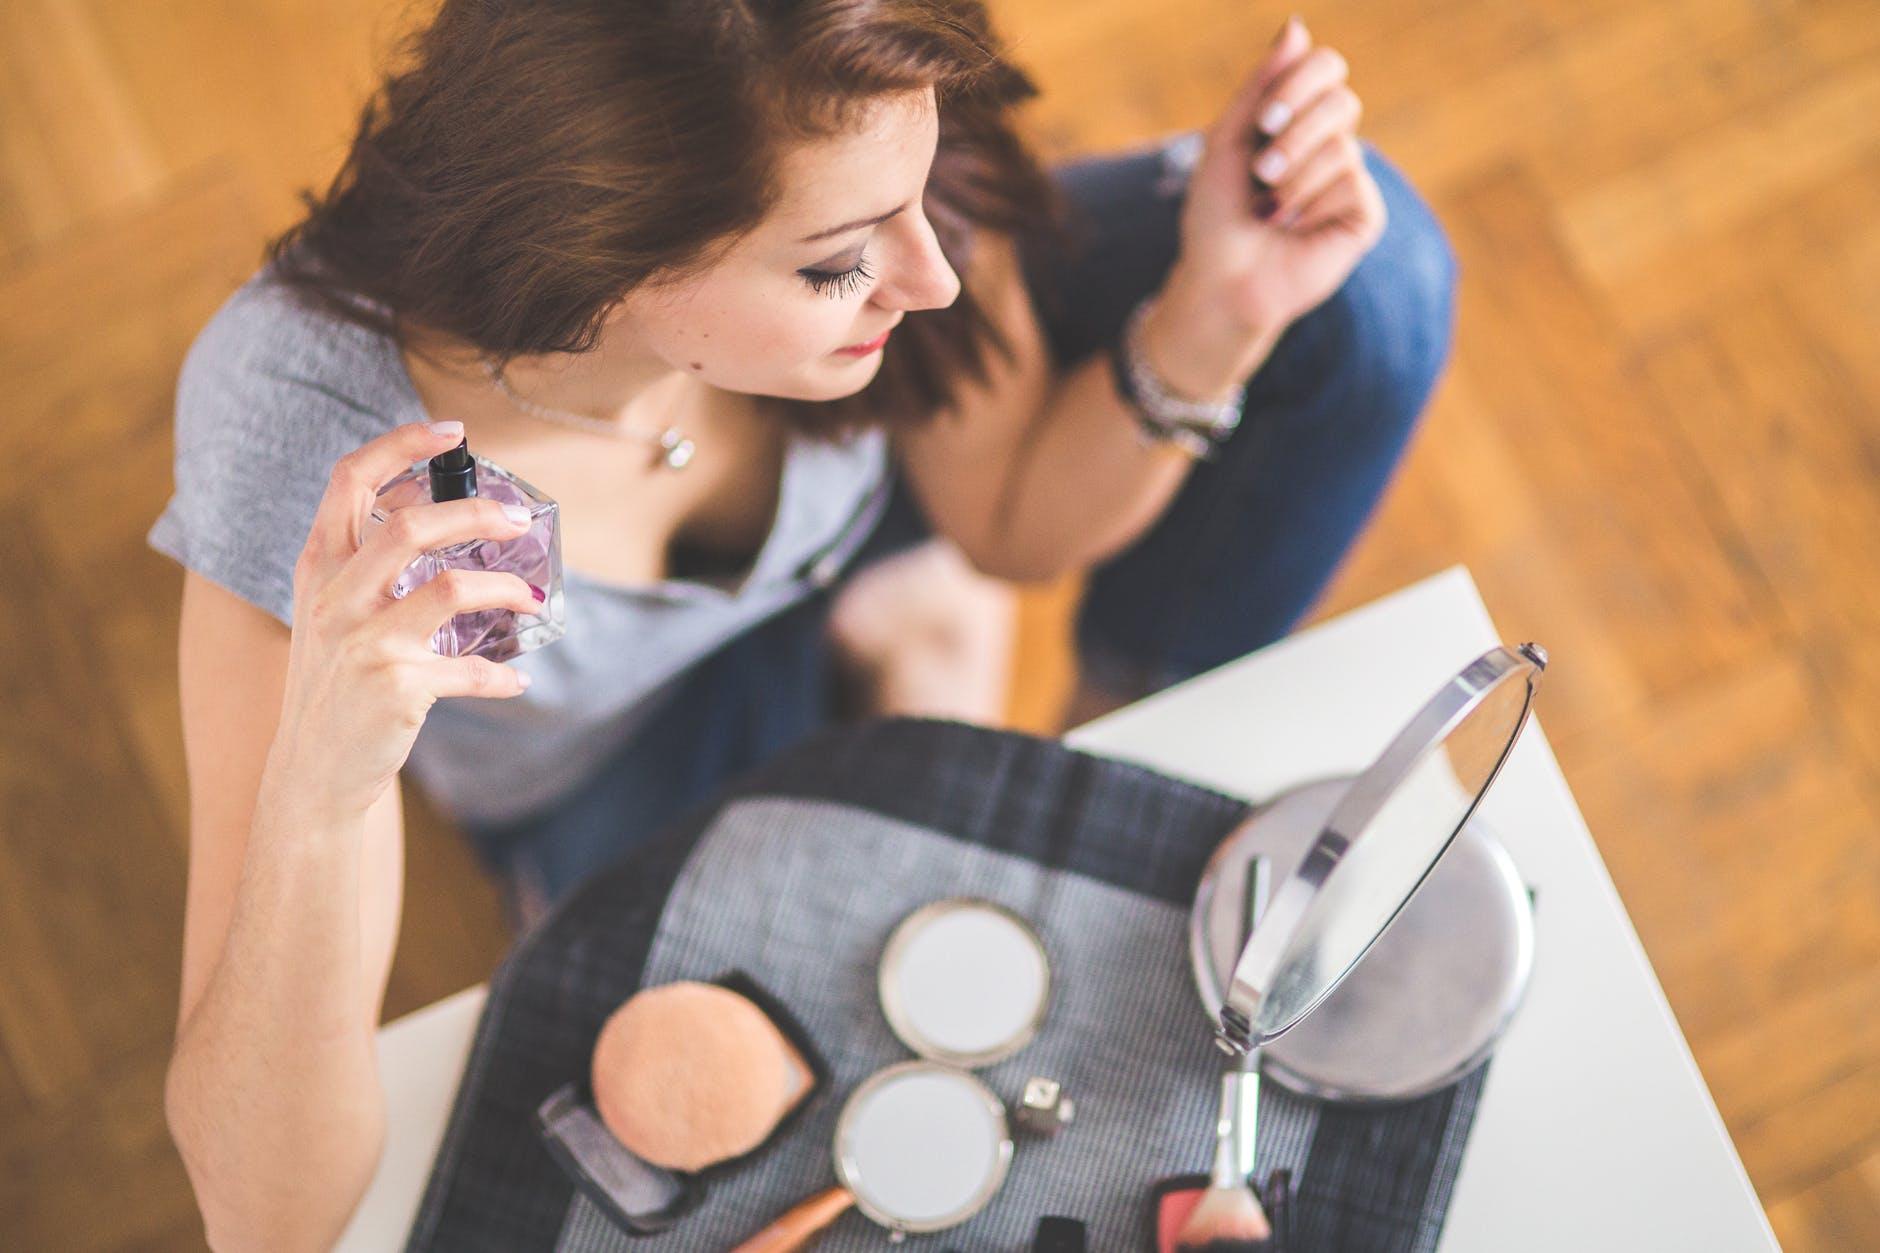 closeup of a young woman applying perfume